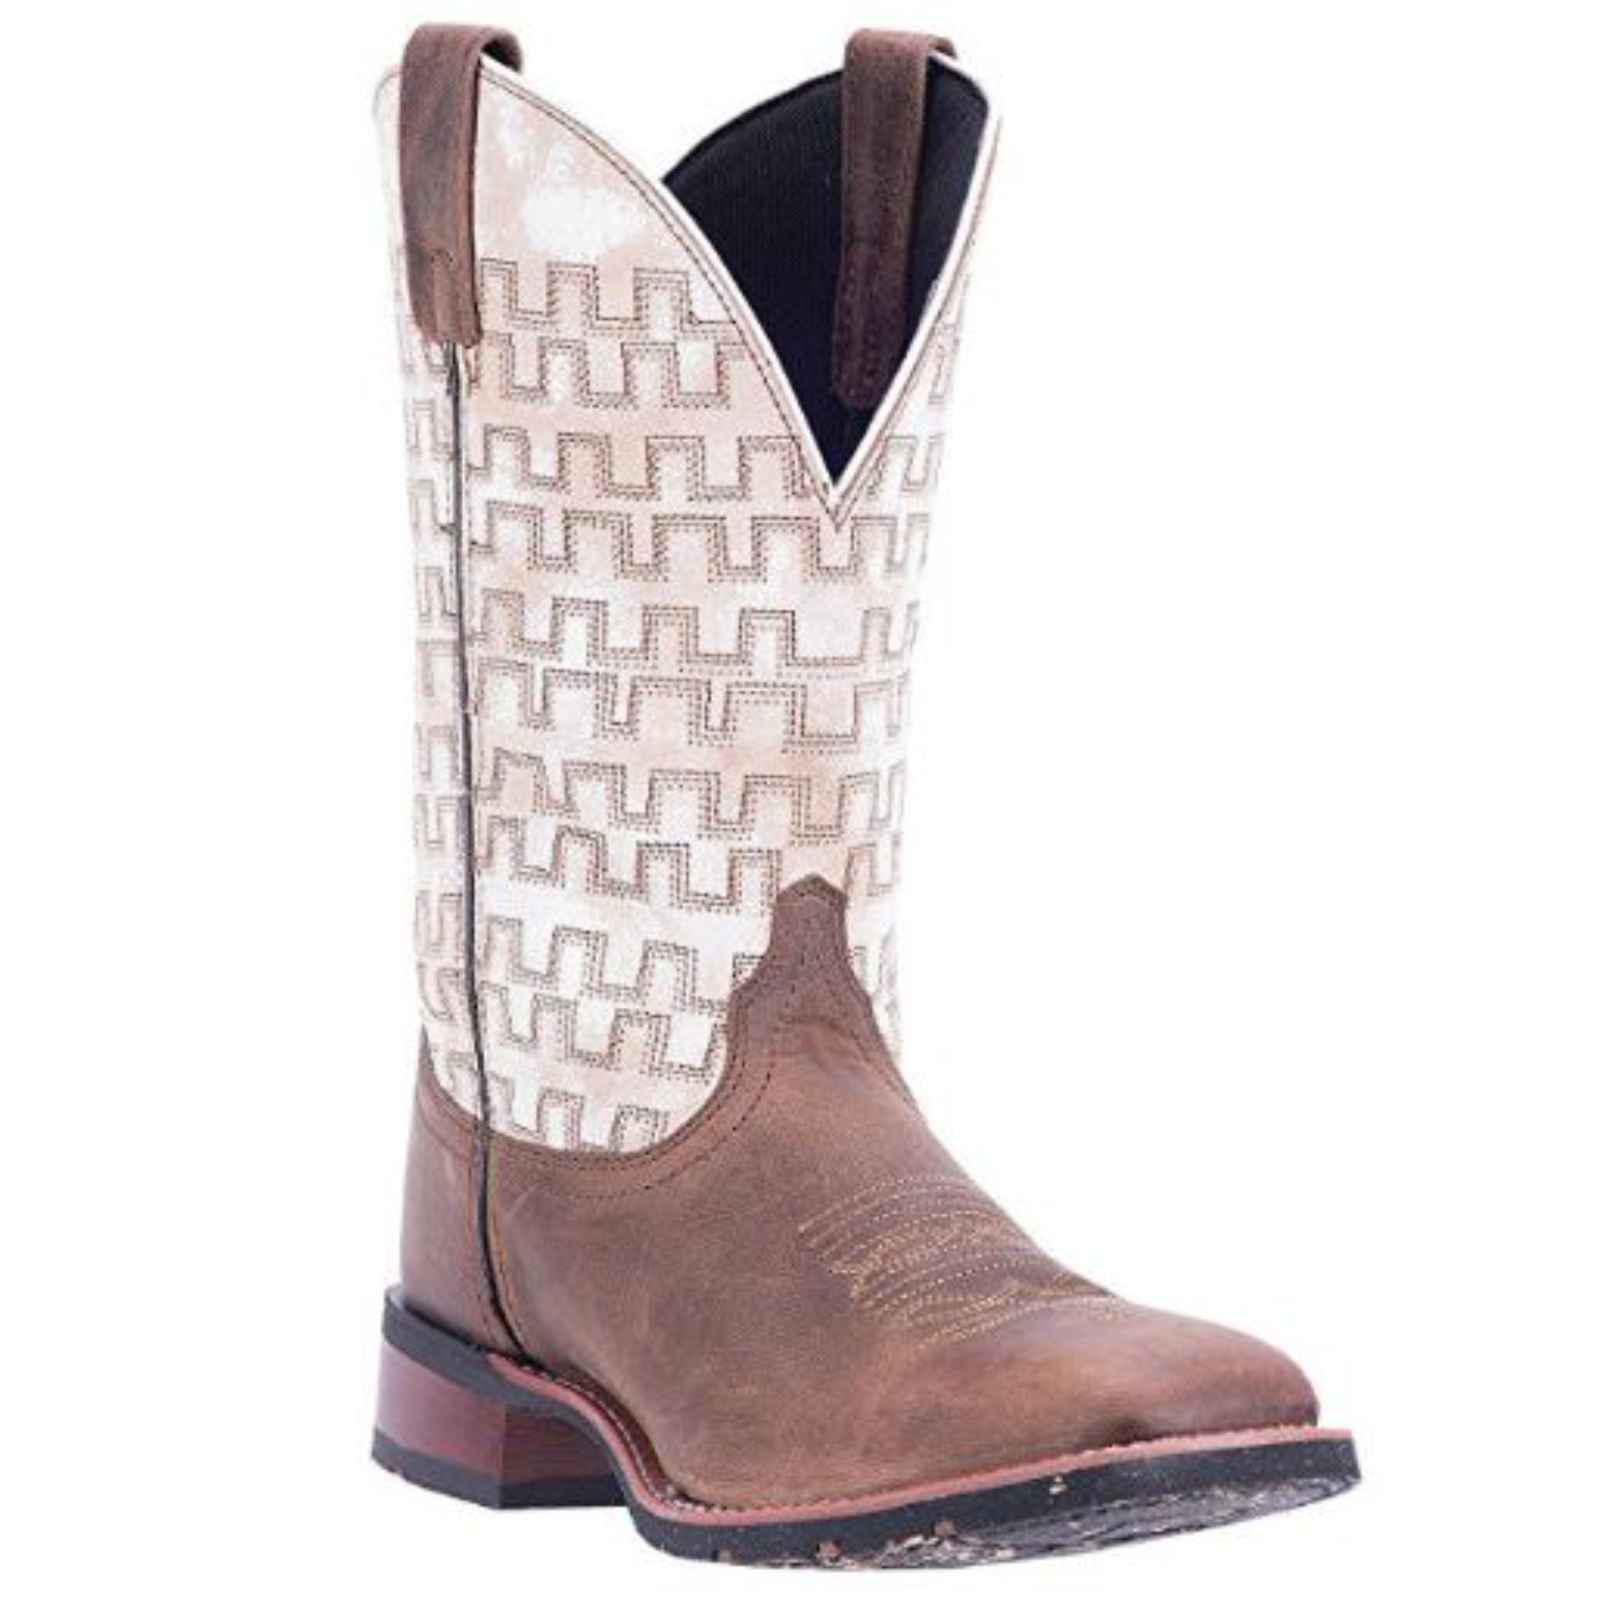 "Laredo Men's 11"" Sand White Broad Square Toe Ultra-Light Boots, 7811 by Dan Post"